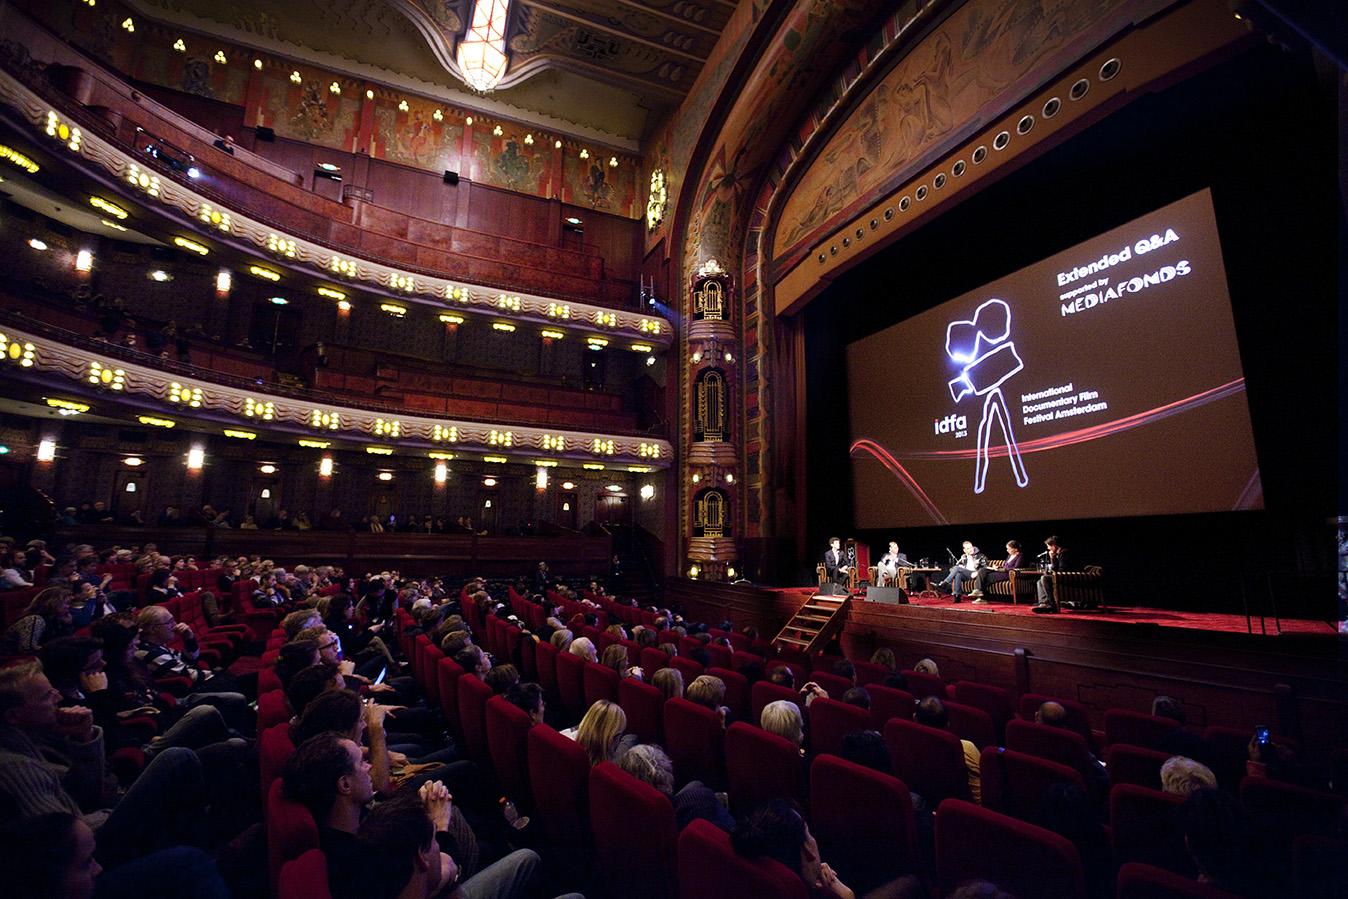 International Documentary Film Festival Amsterdam, IDFA 2013. Photo: Felix Kalkman.